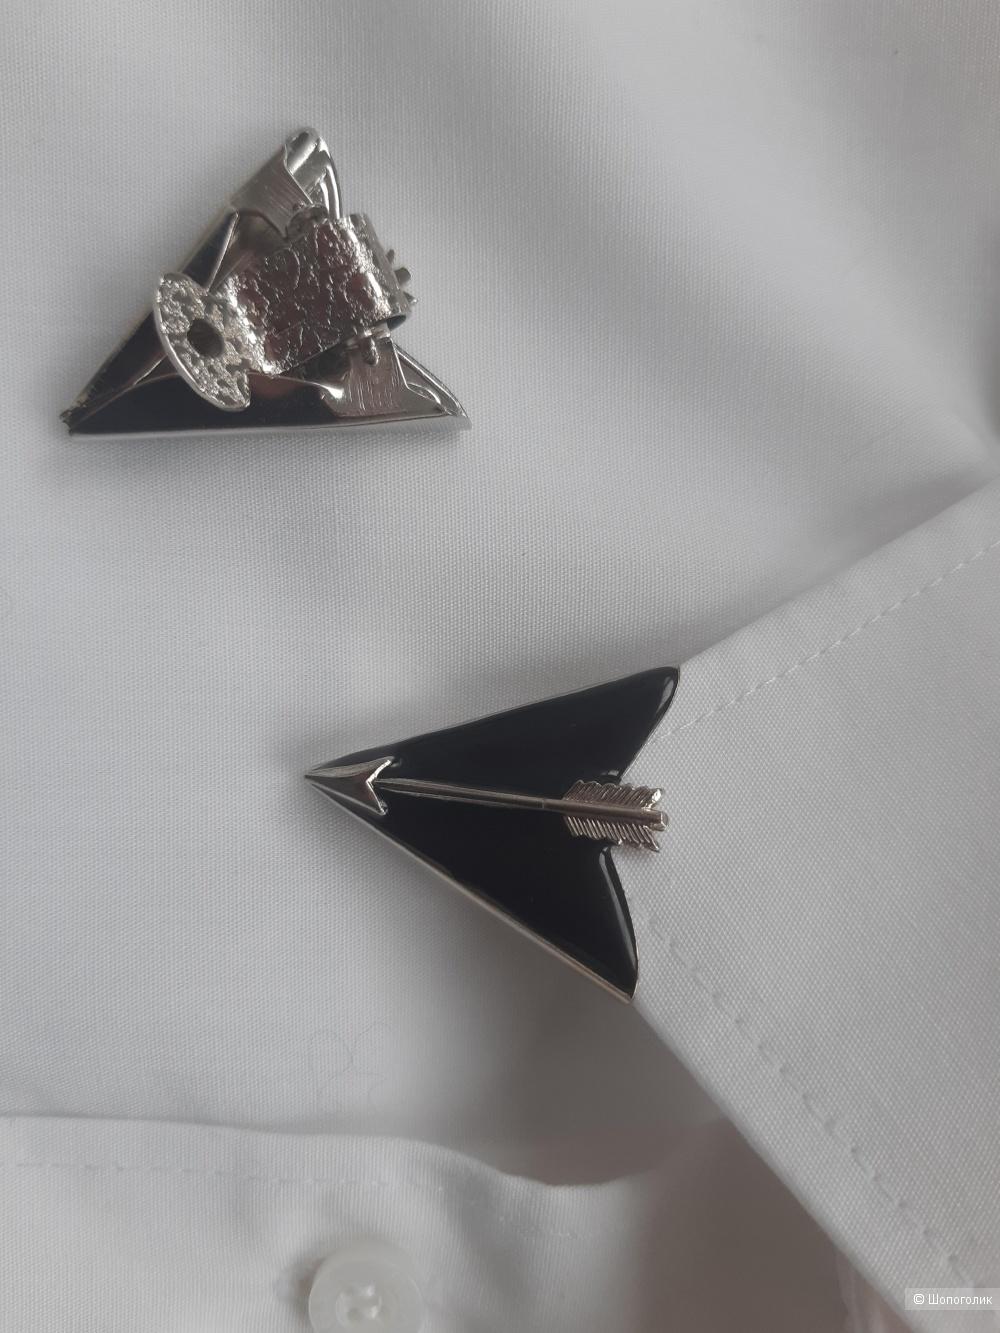 Уголки декоративные на воротник рубашки